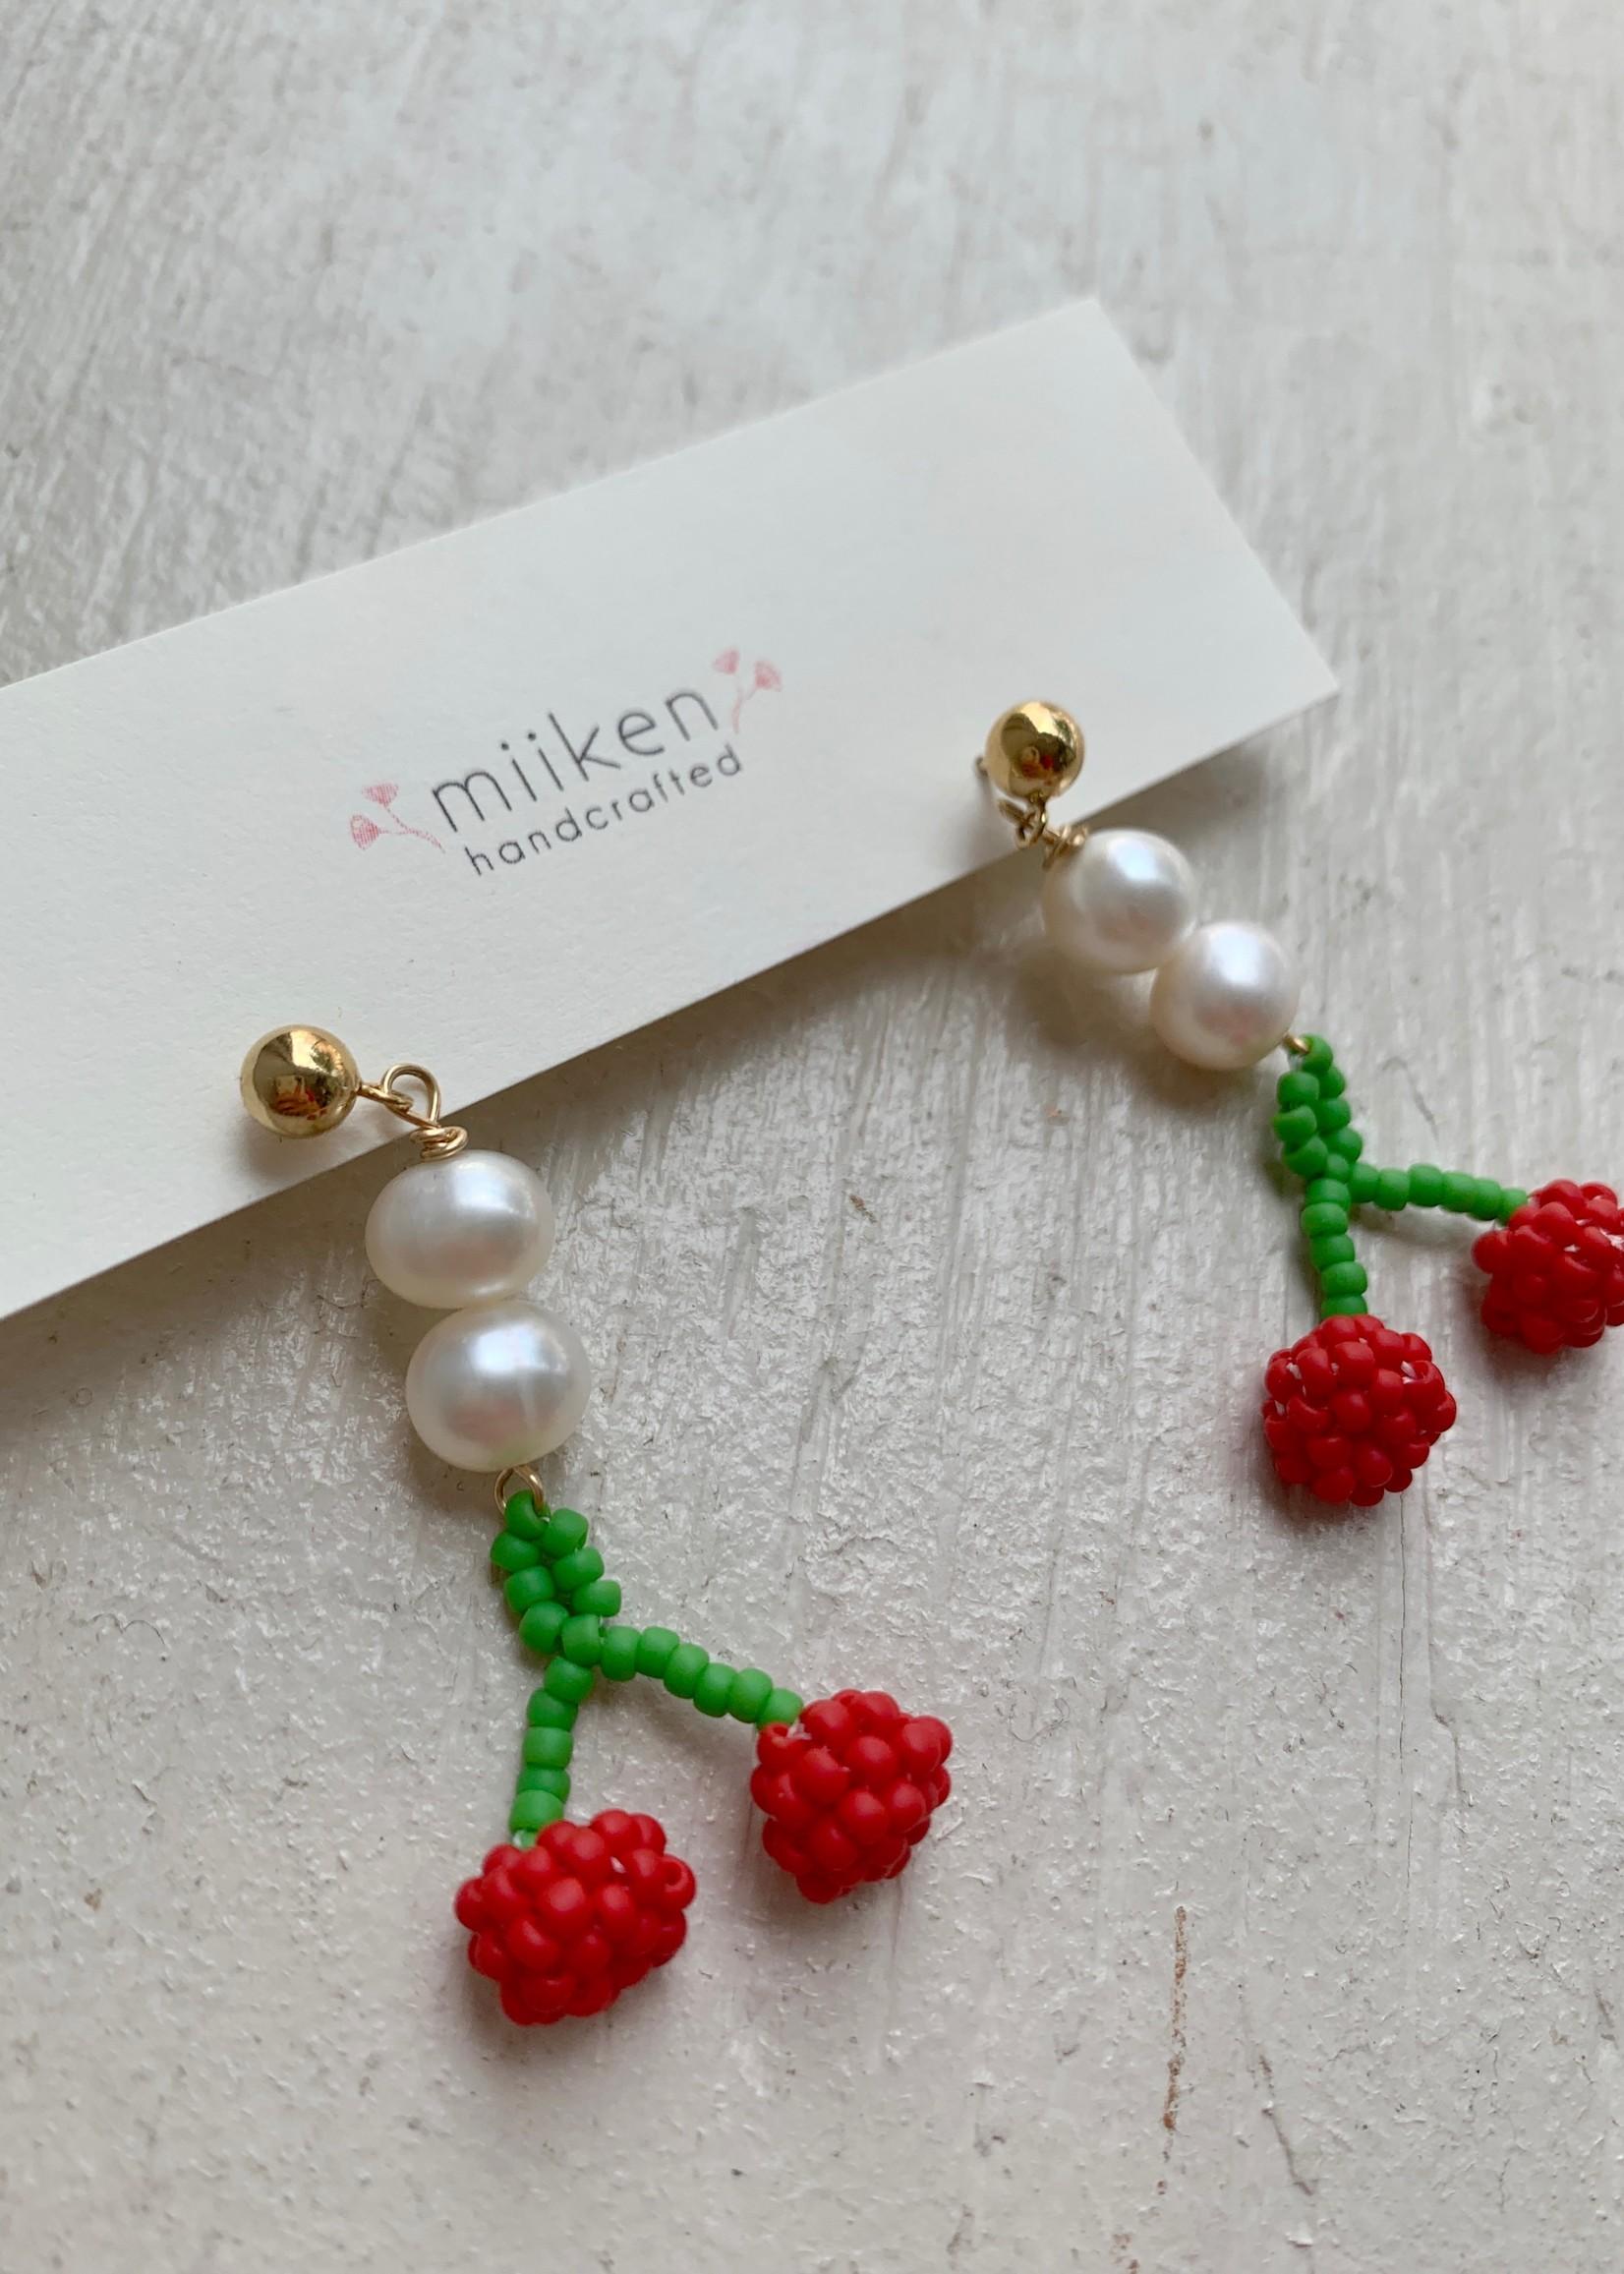 Miiken Handcrafted Sakura Pearl Drop Earrings by Miiken Handcrafted